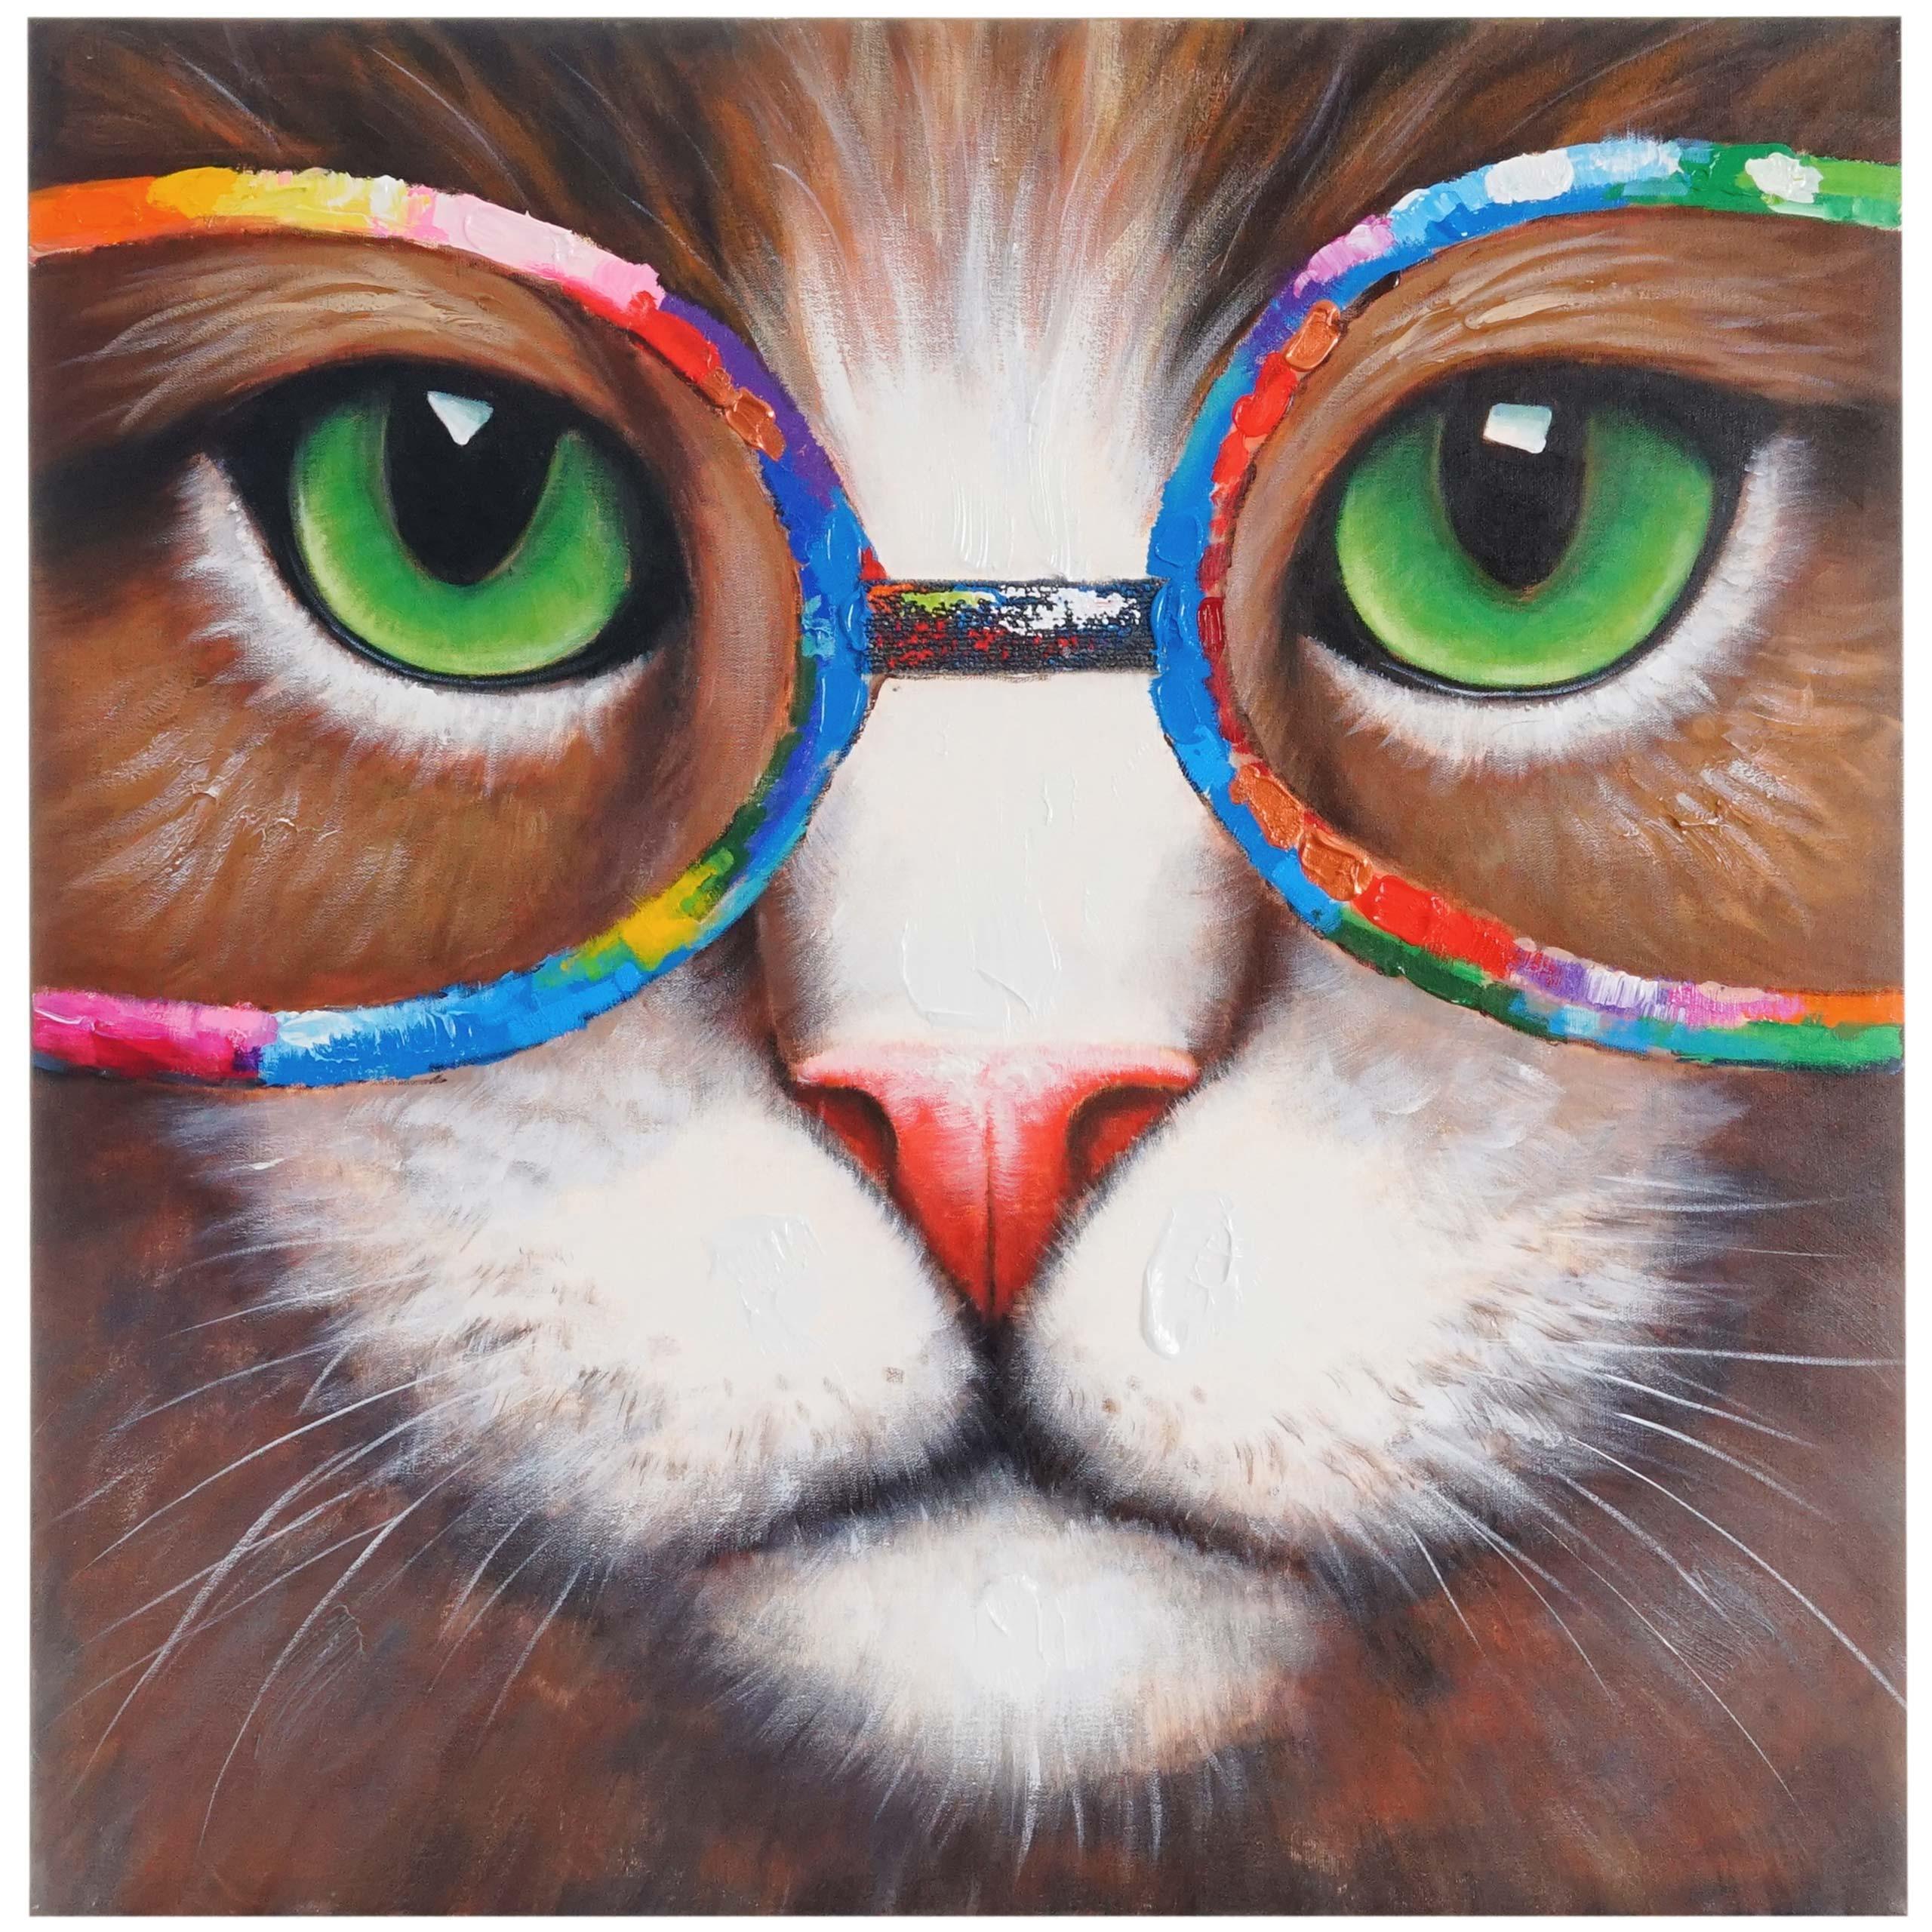 Cuadro gato 90x90x3 5 cm pintado a mano al leo cuadro for Cuadros pintados al oleo